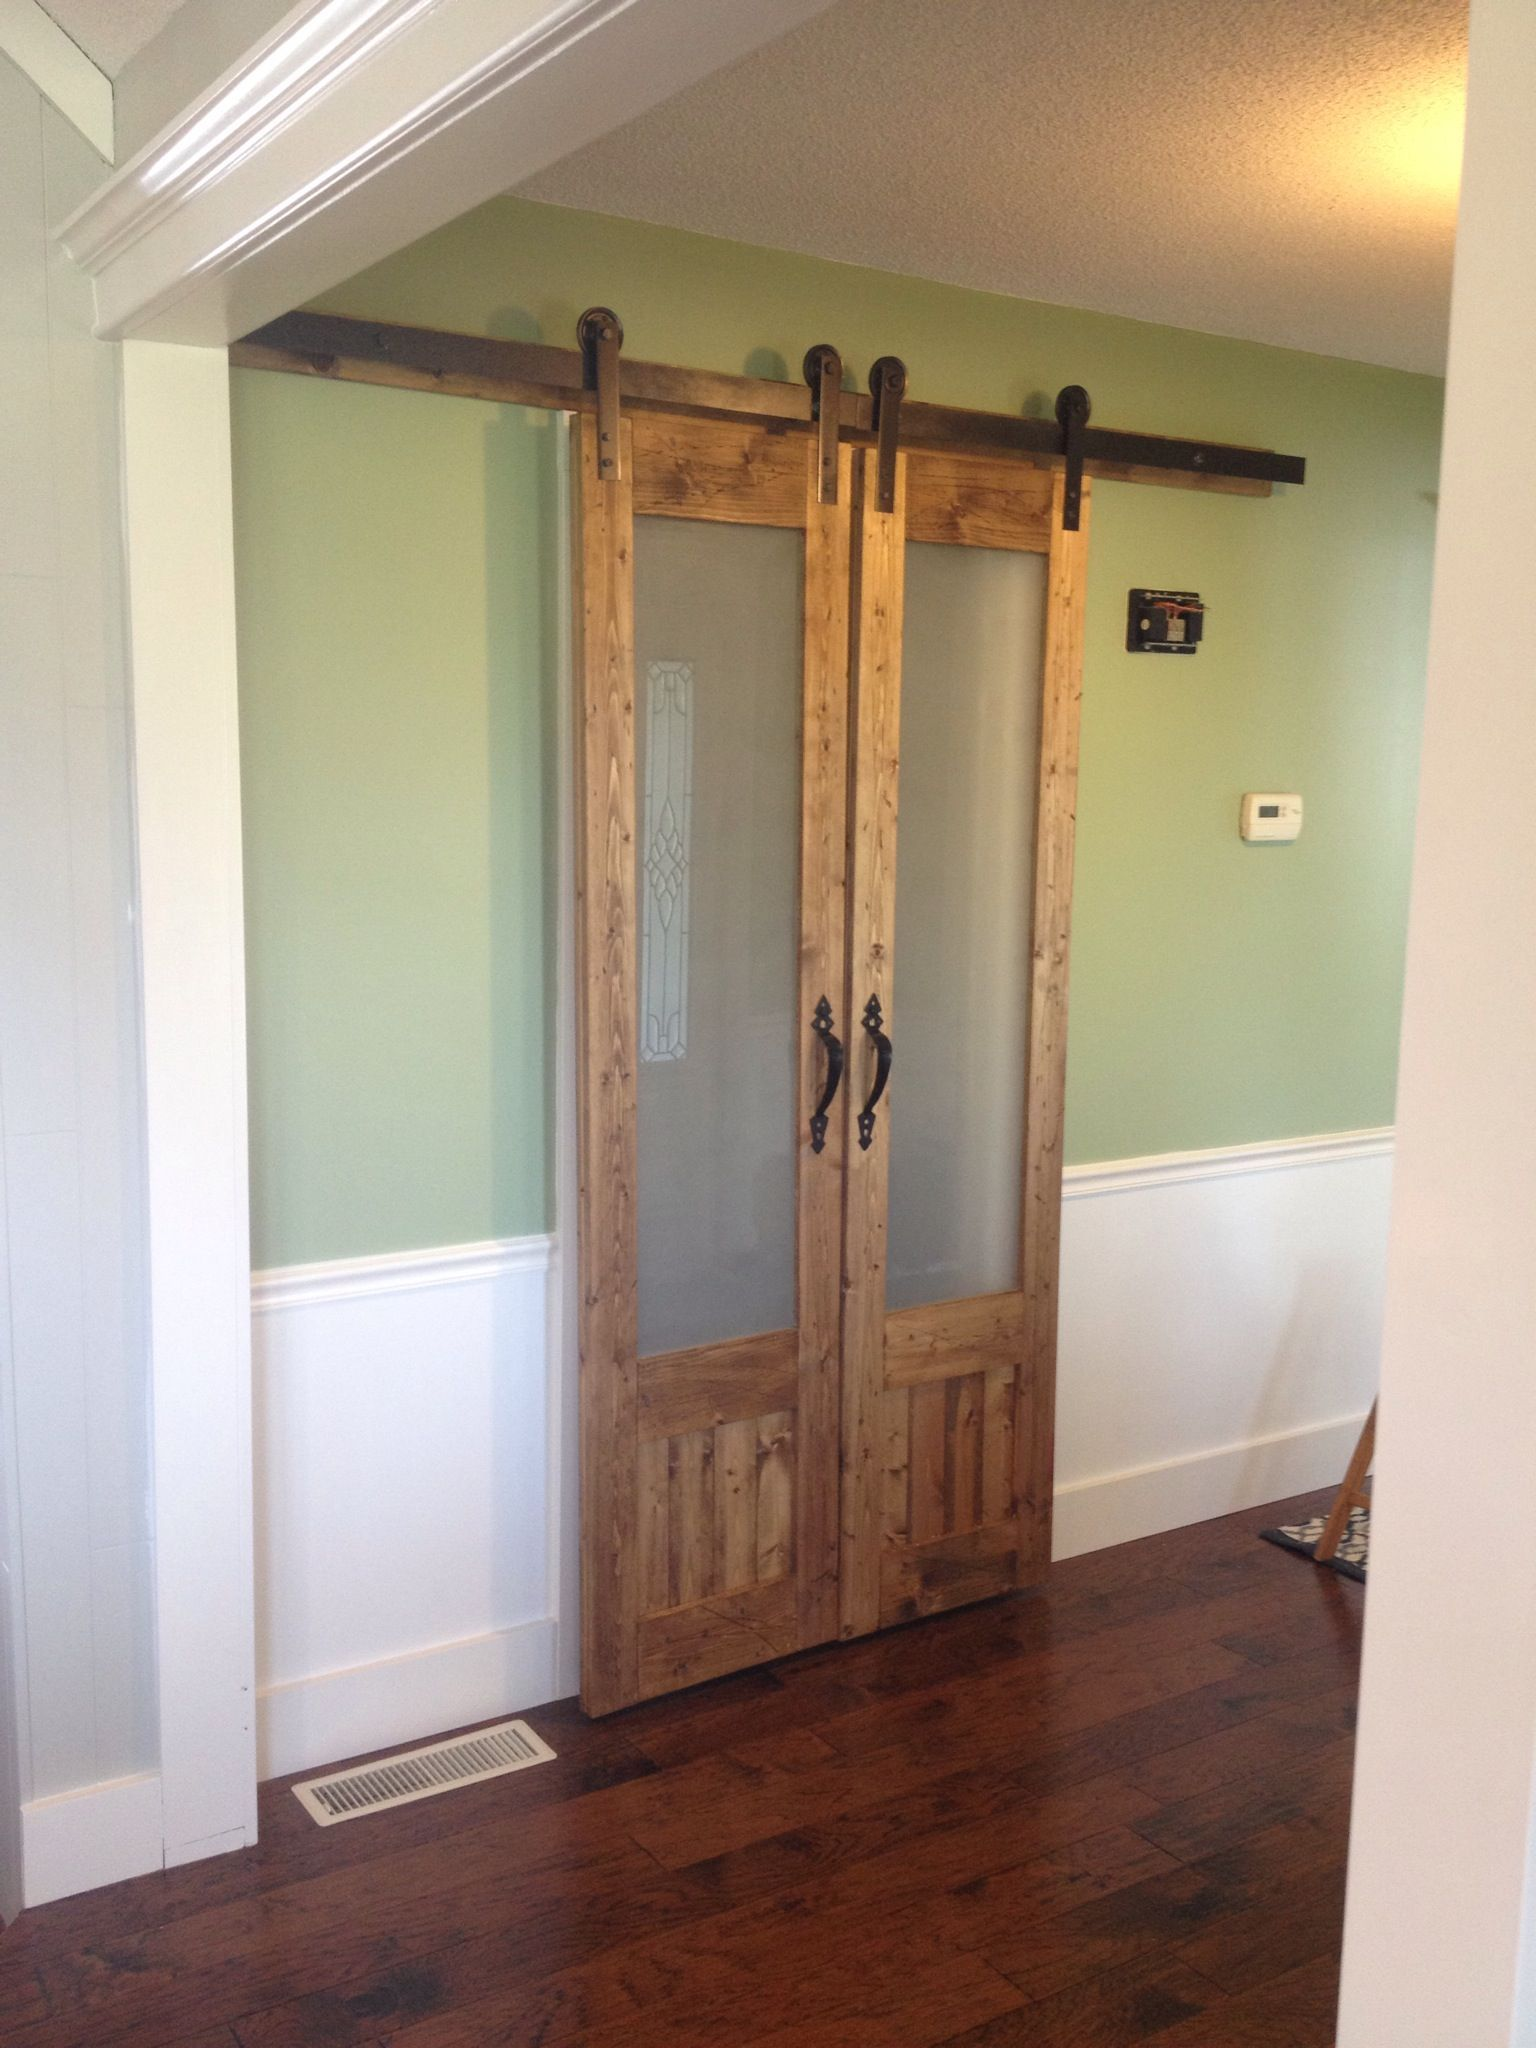 Diy Built The Doors For Around 60 20 Lumber 40 Glass Panes